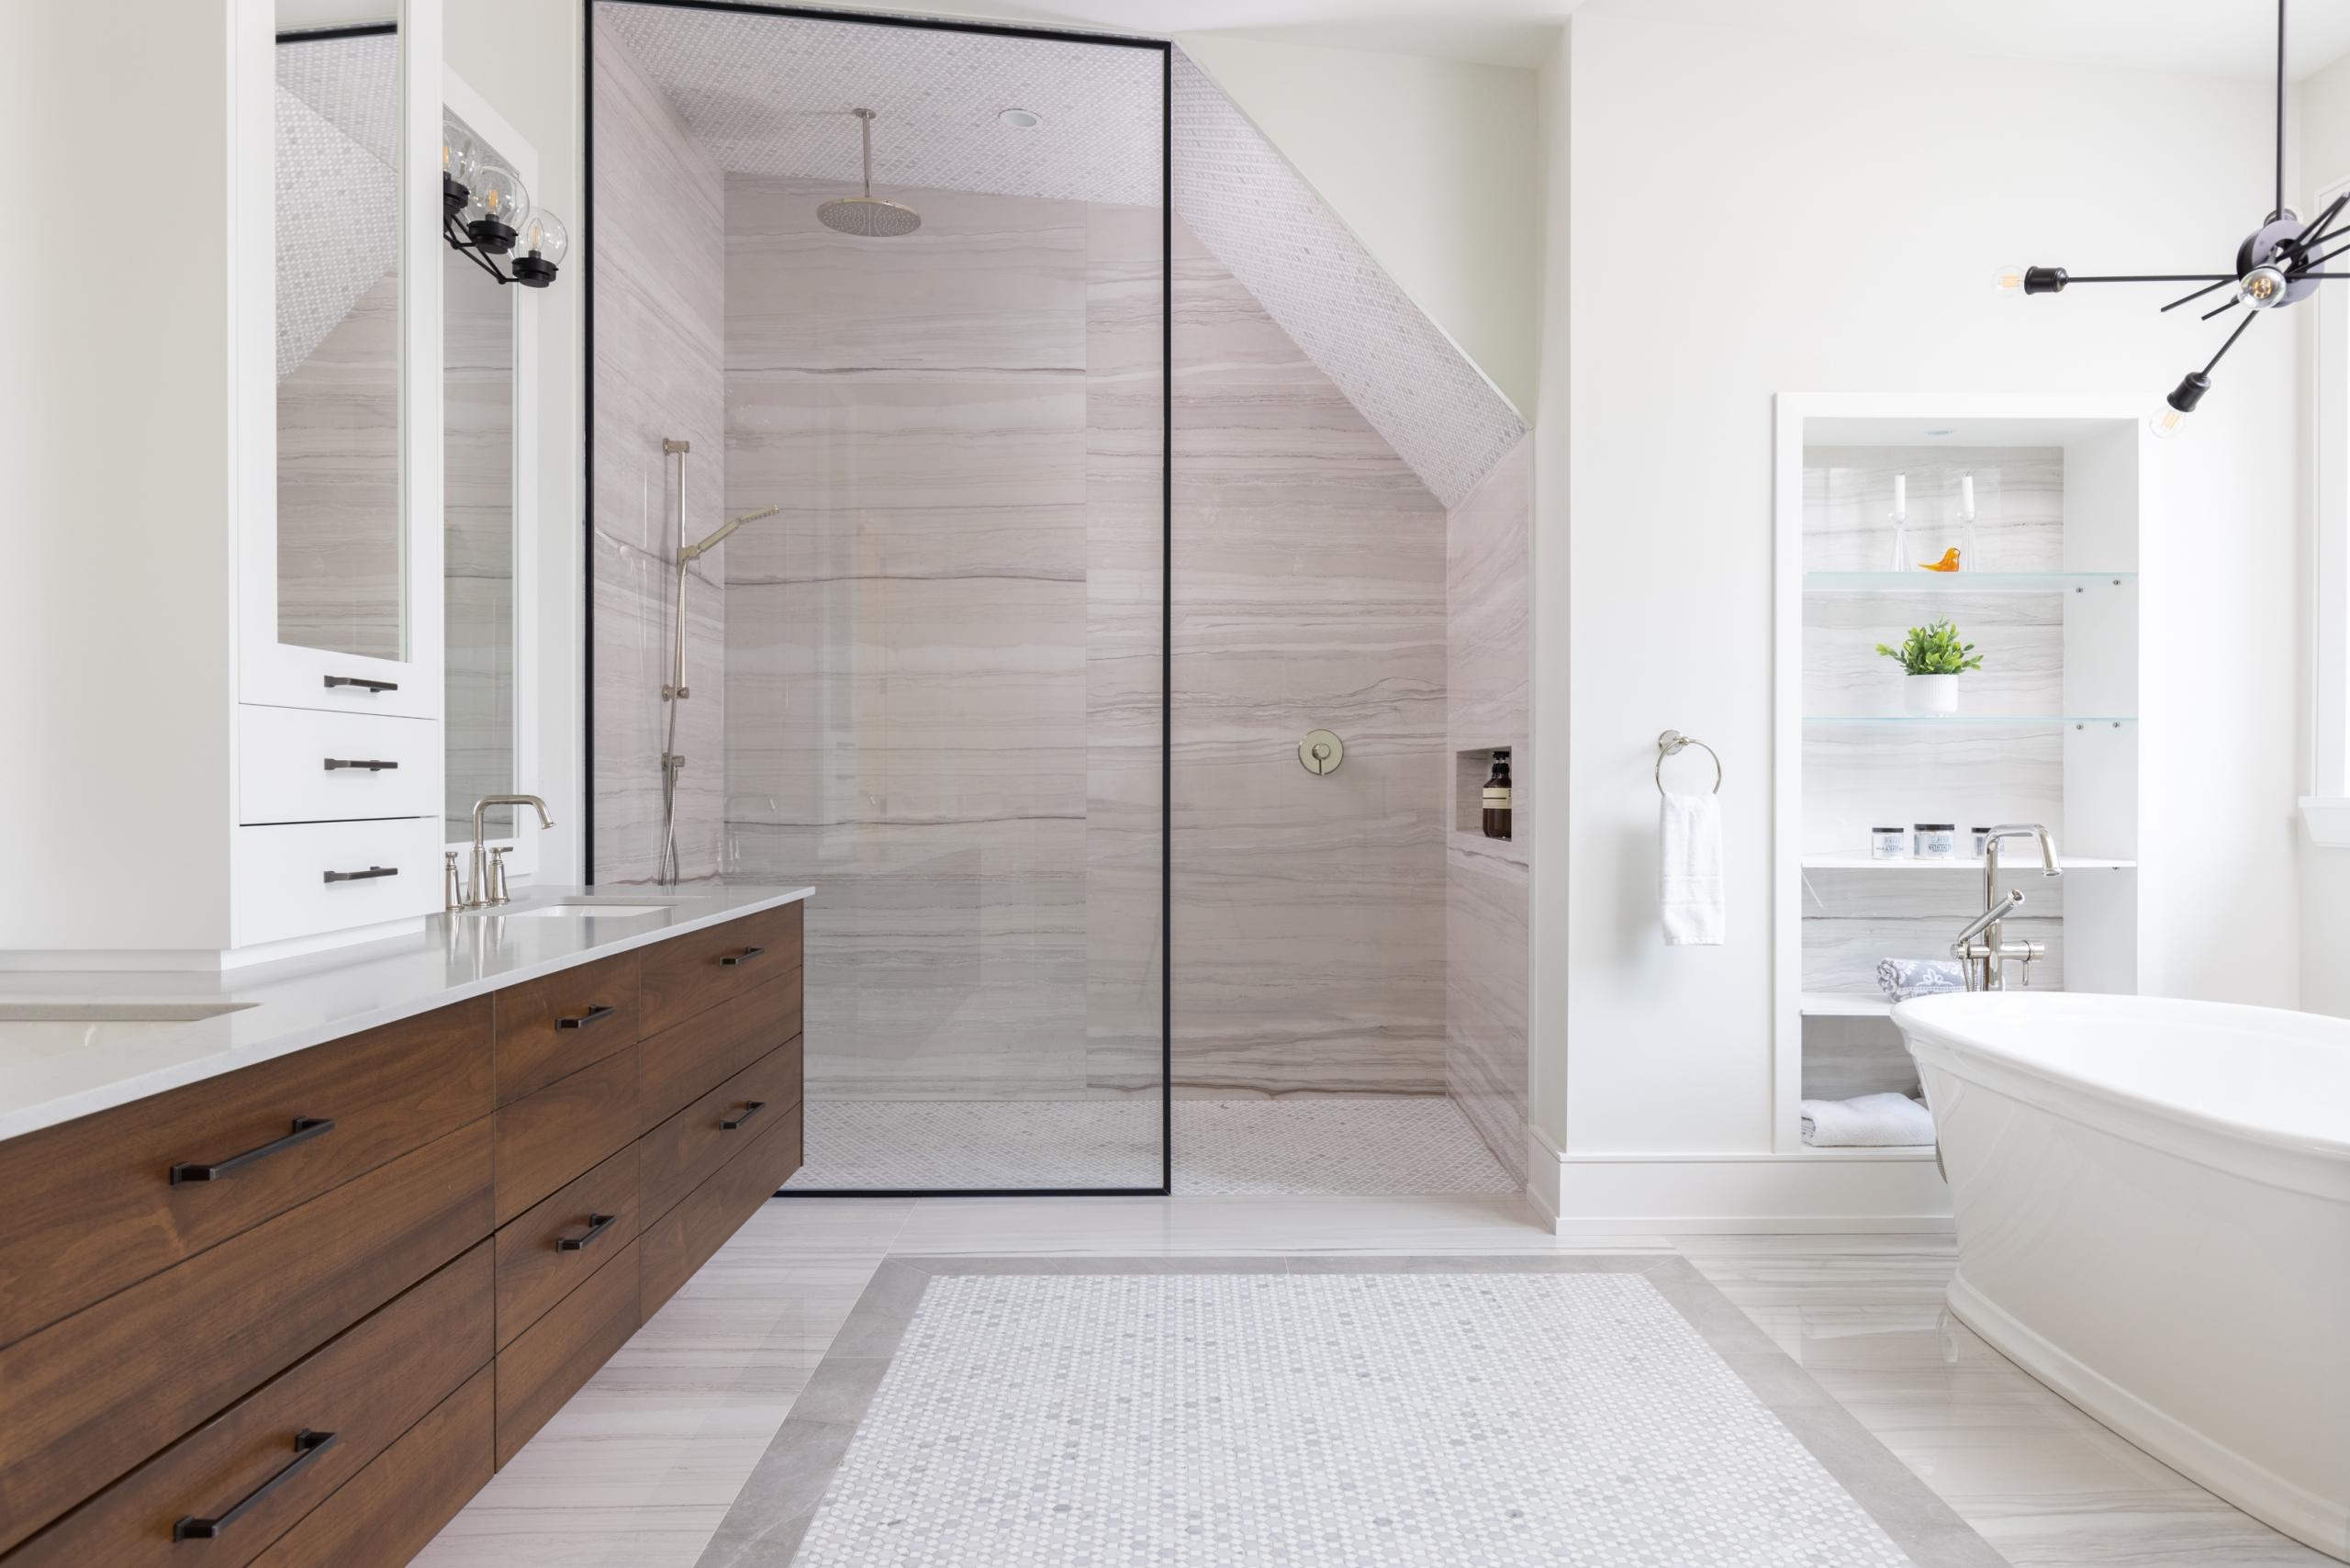 Bathroom featured at 489 Lakeshore Road W, Oakville at Alex Irish & Associates